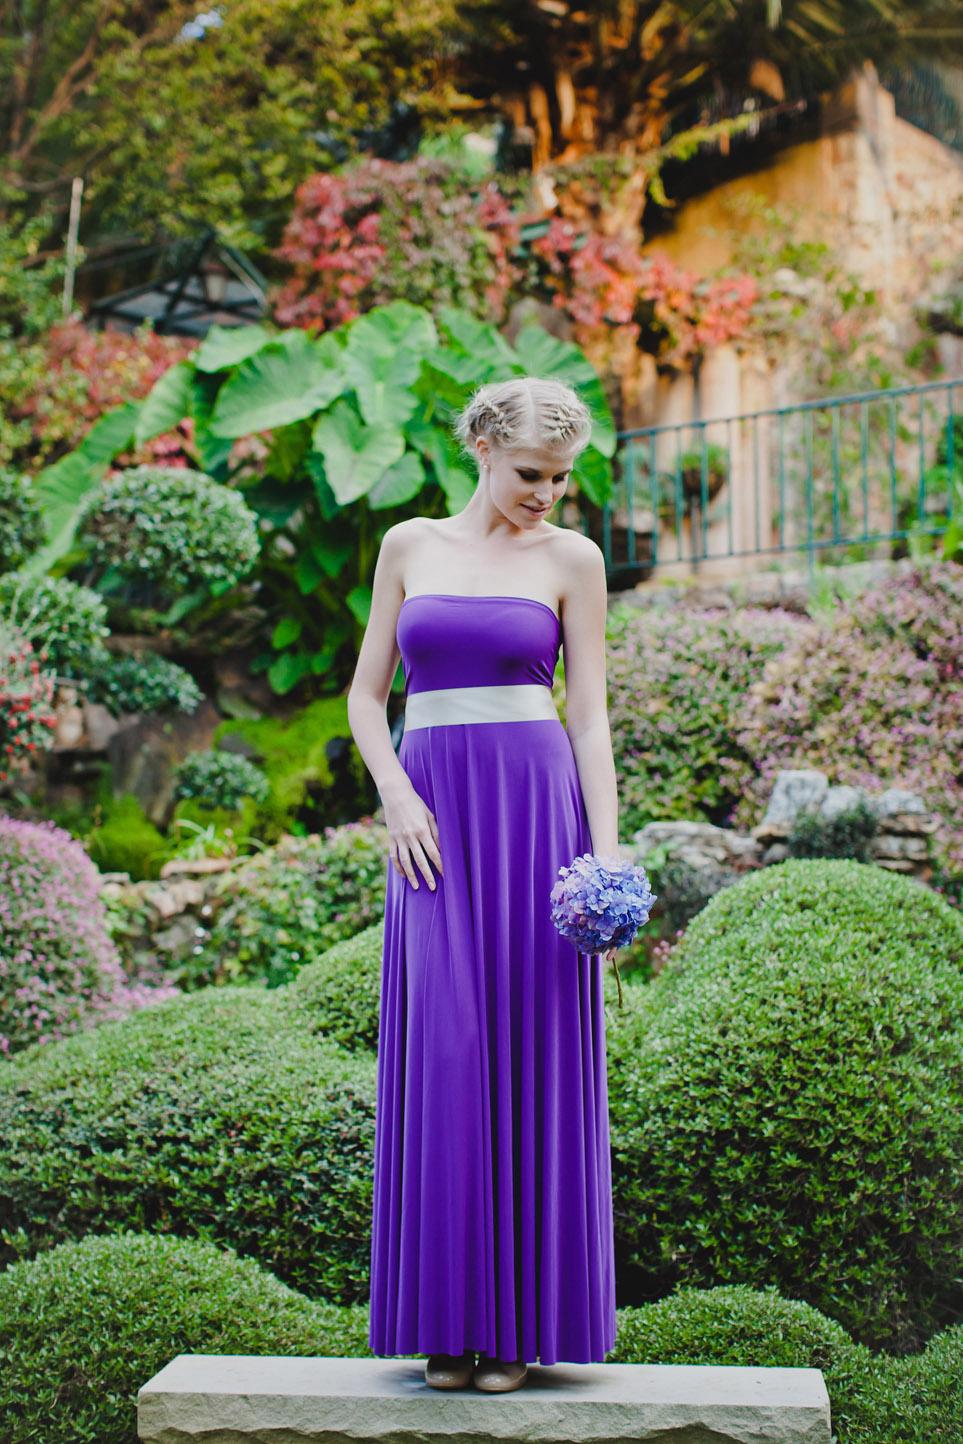 c96153f1d88 Gelique Emma Dress